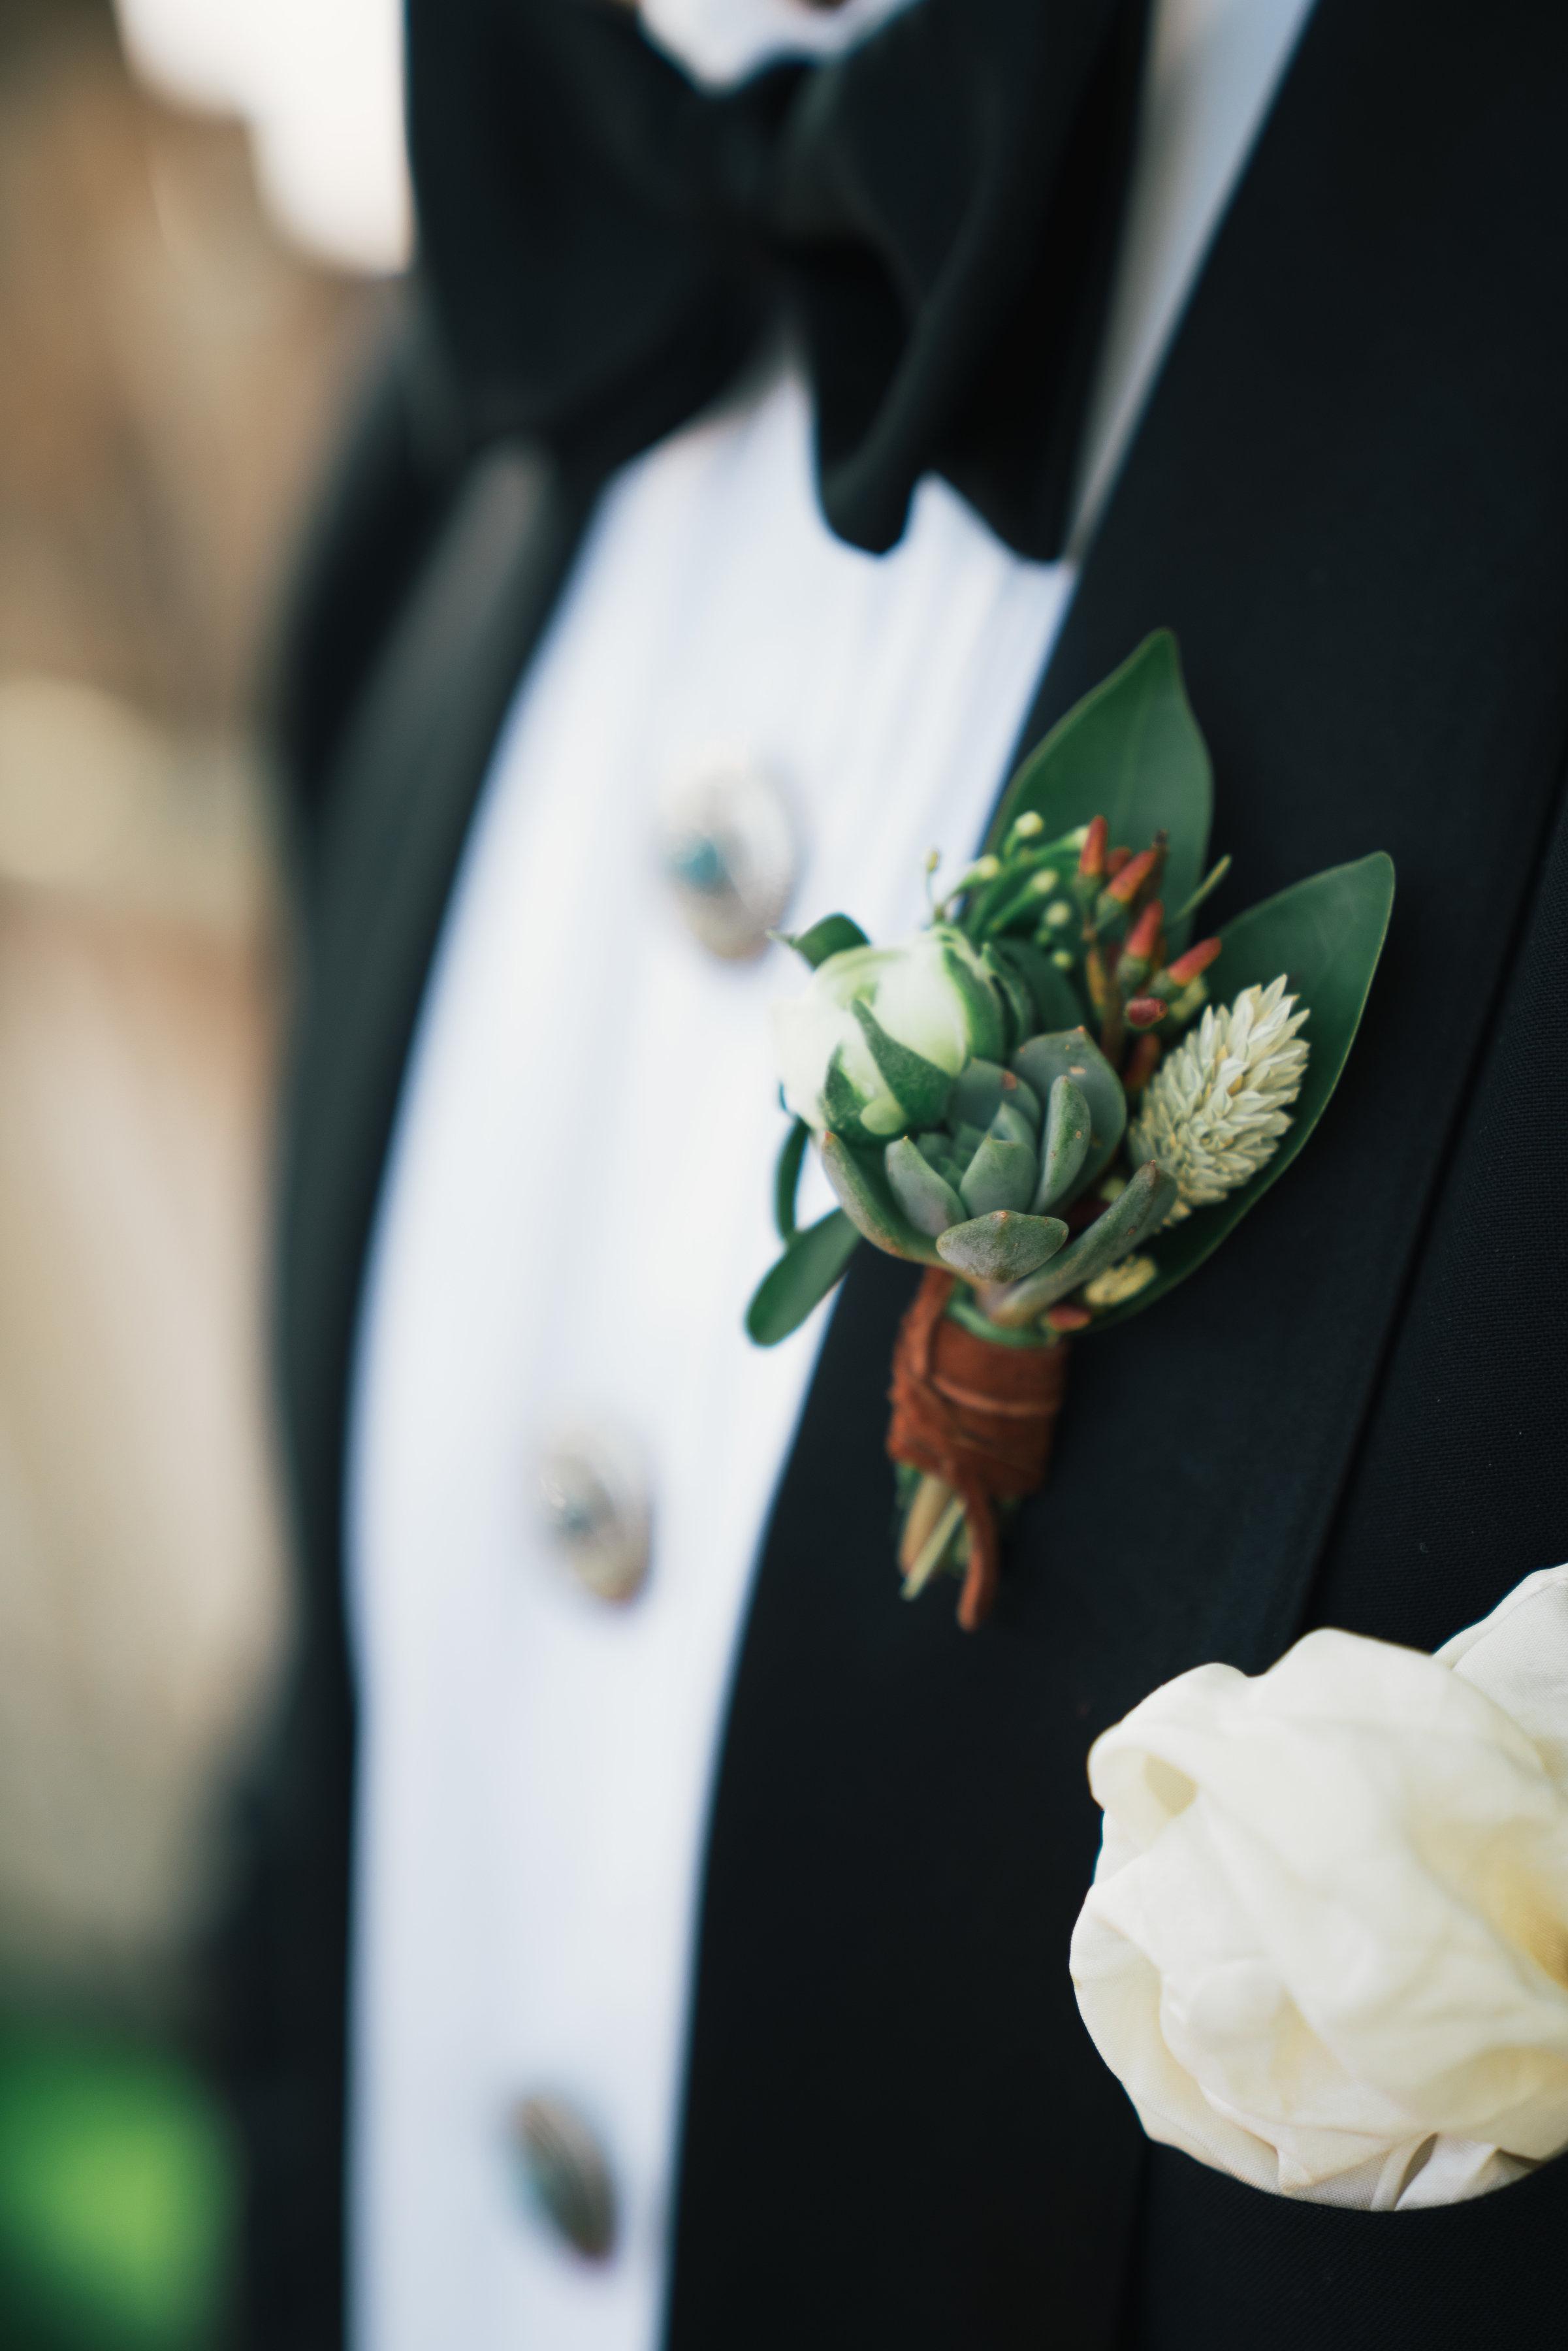 landry_lovelace_wedding_jbobephoto-244.jpg